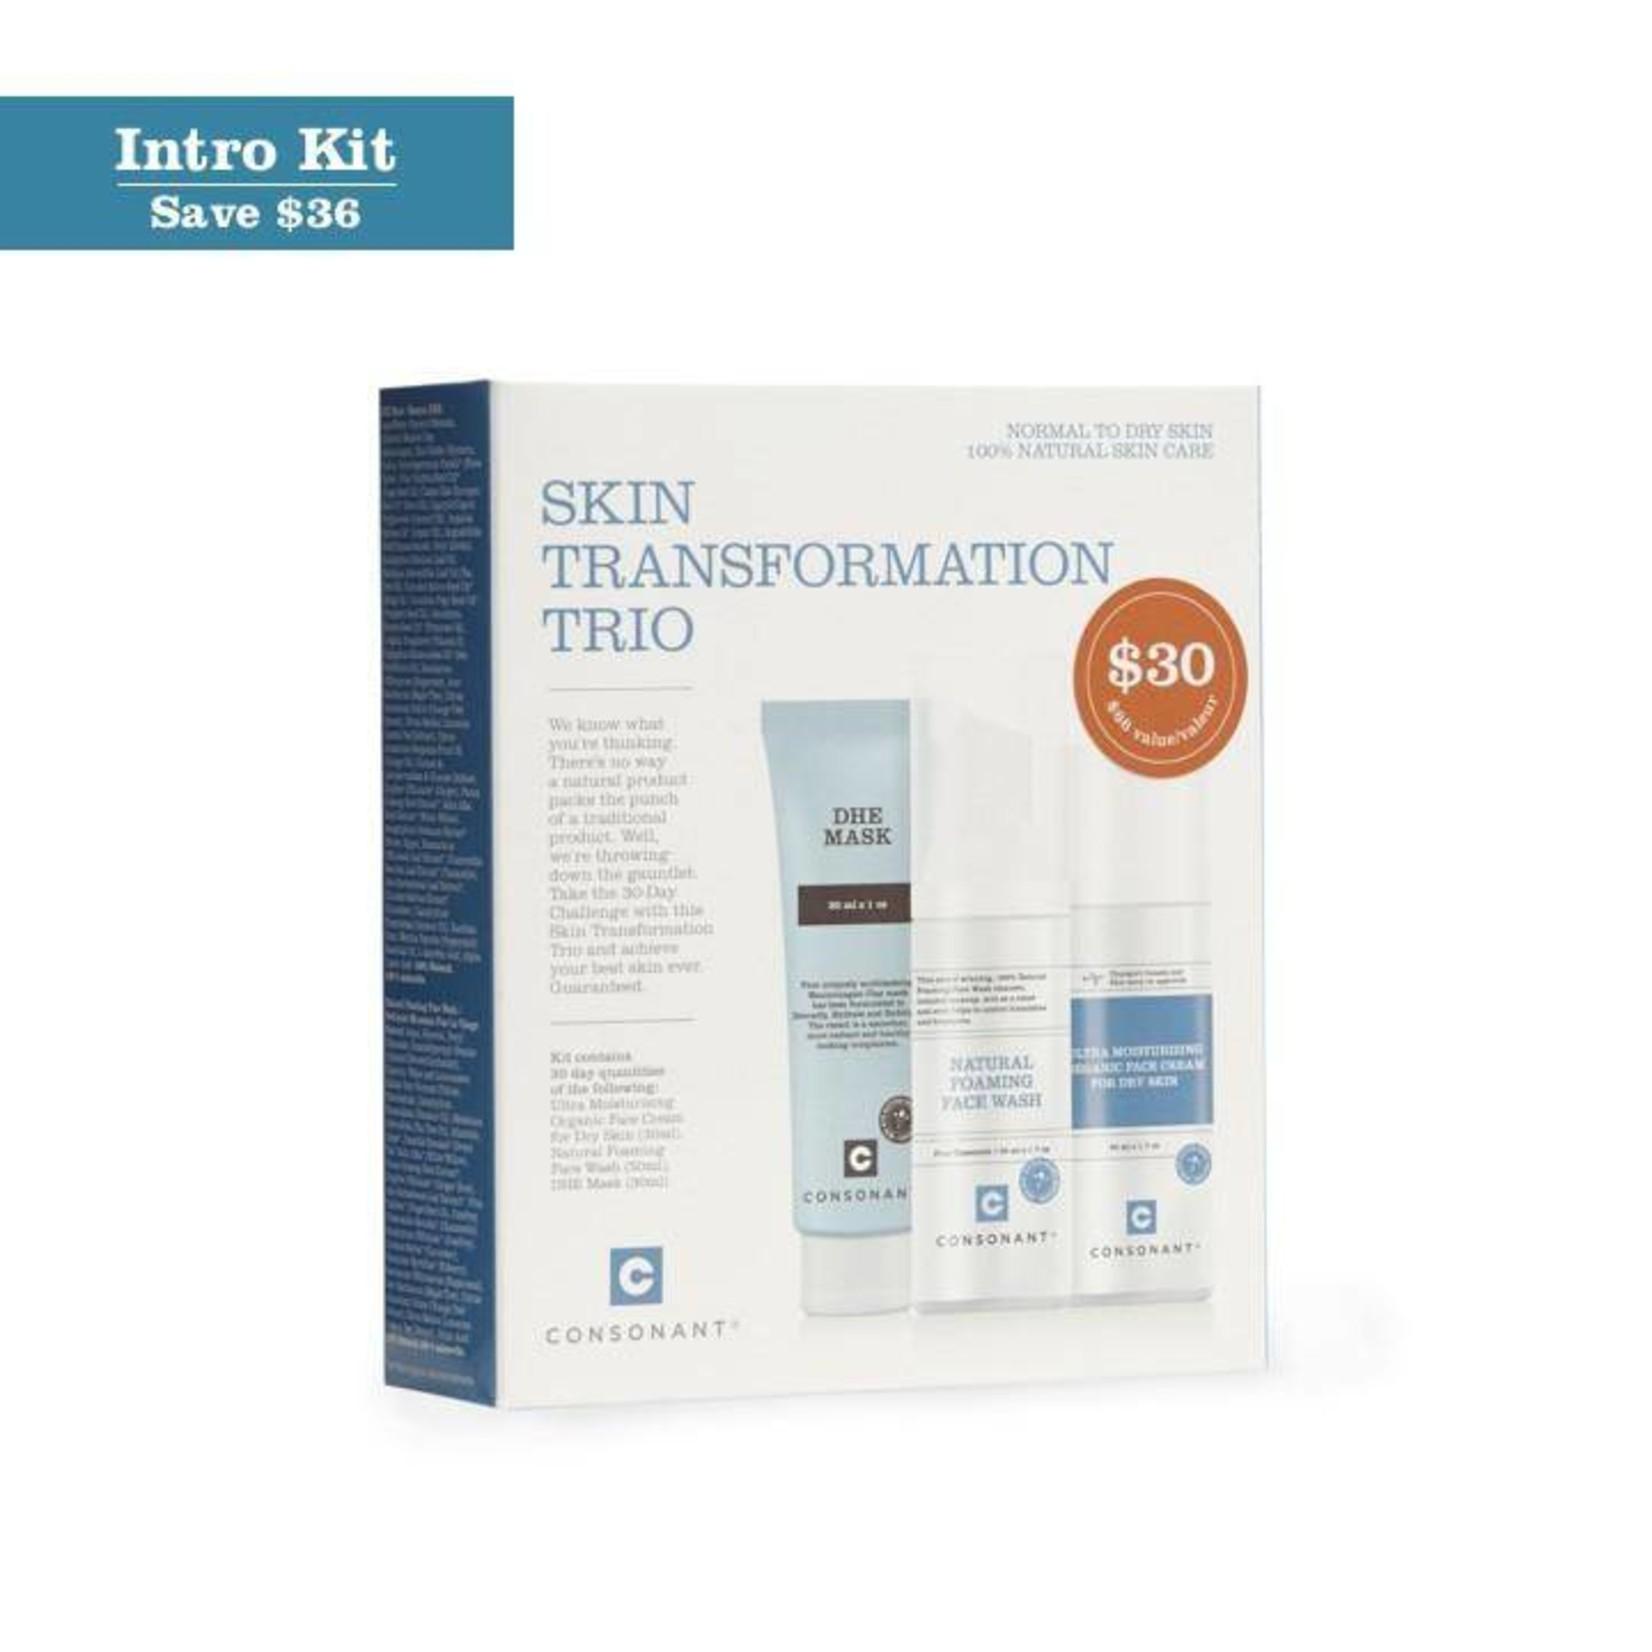 Consonant Skin Care Consonant Skin Transformation Trio- Normal to Dry Skin